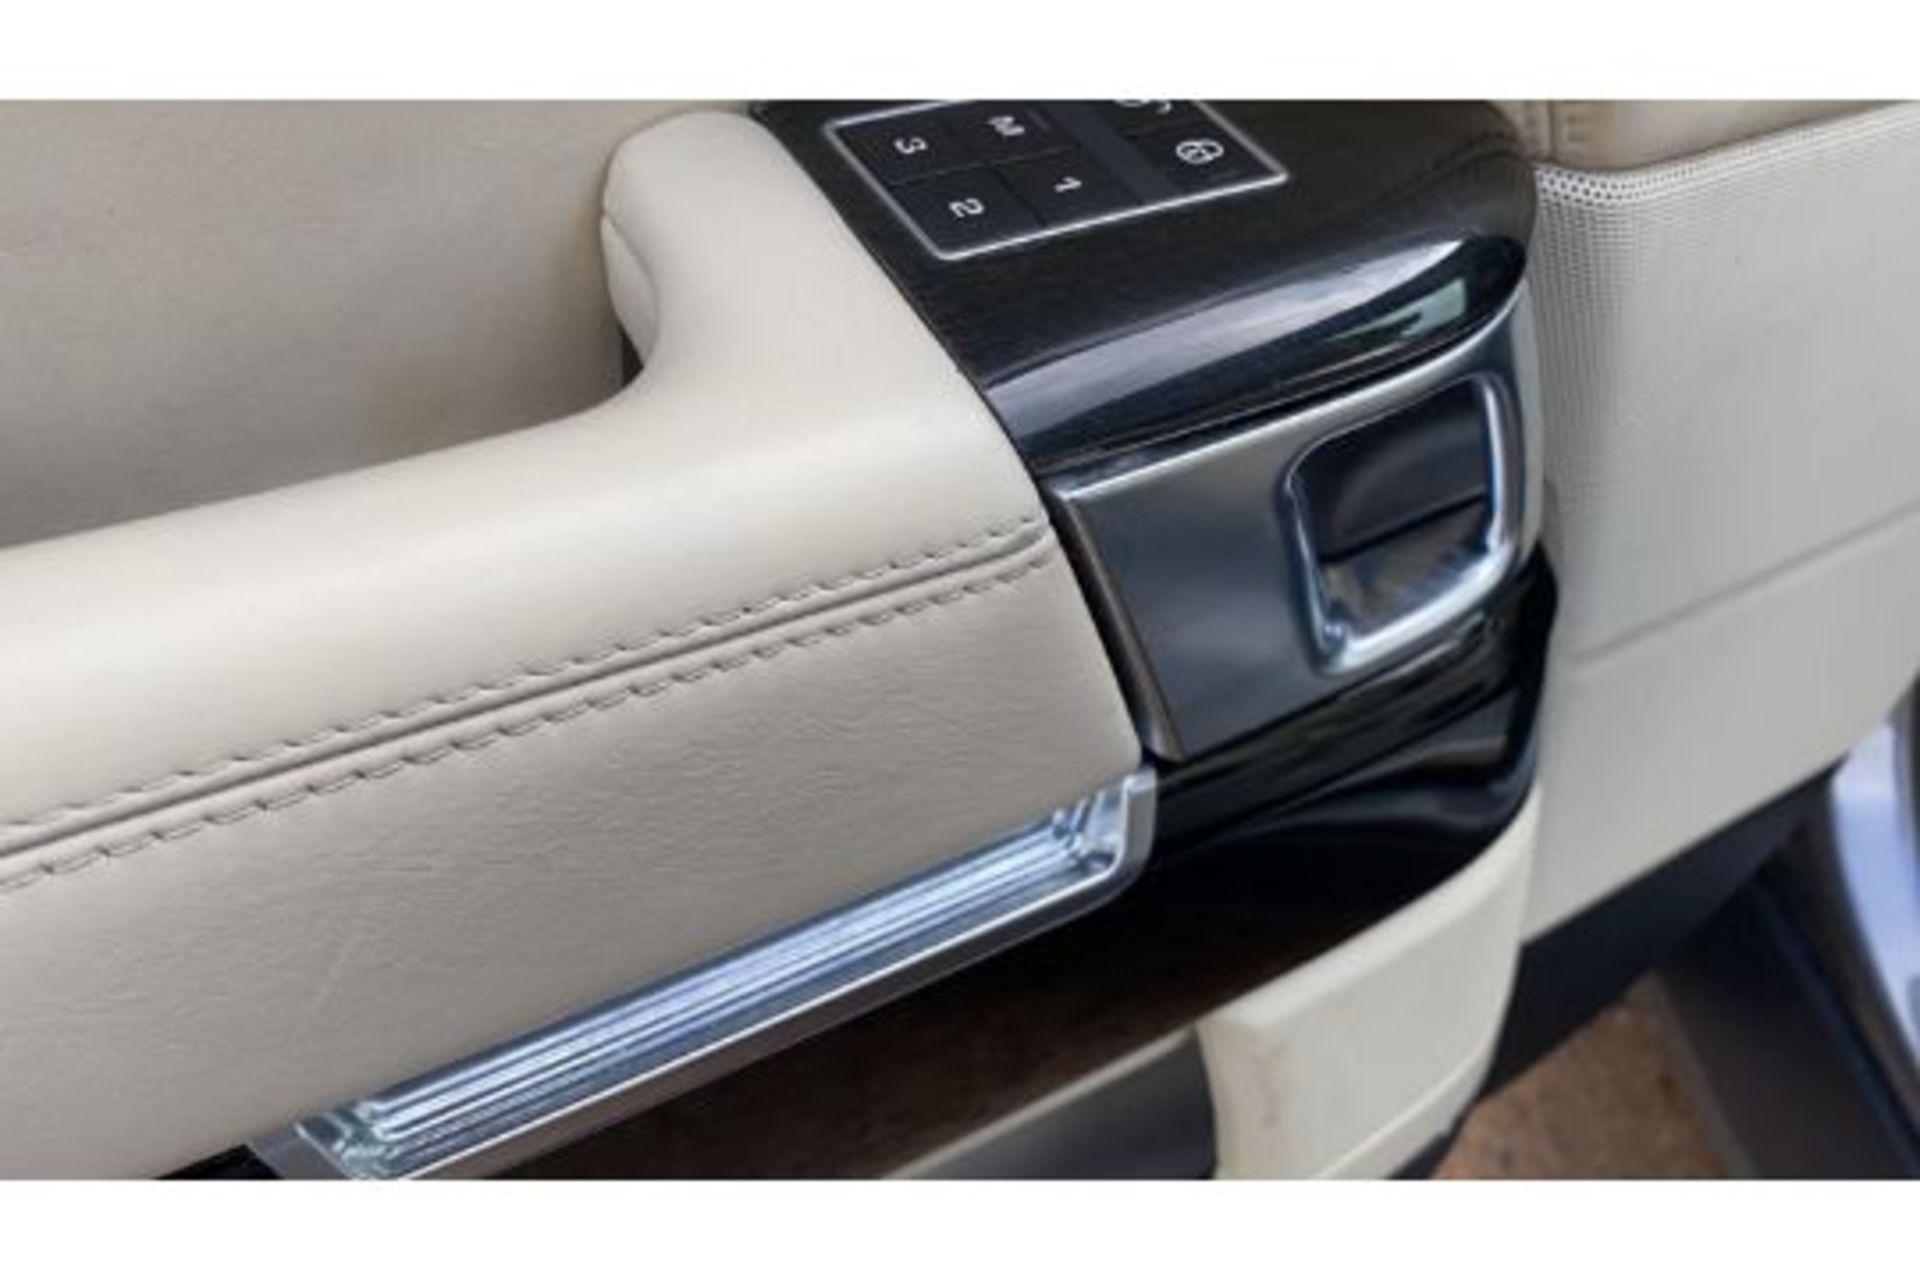 Range Rover Vogue 3.0 TDV6 SE Auto - Black Pack - NEW SHAPE - FULLY LOADED - Pan Roof - Image 19 of 30